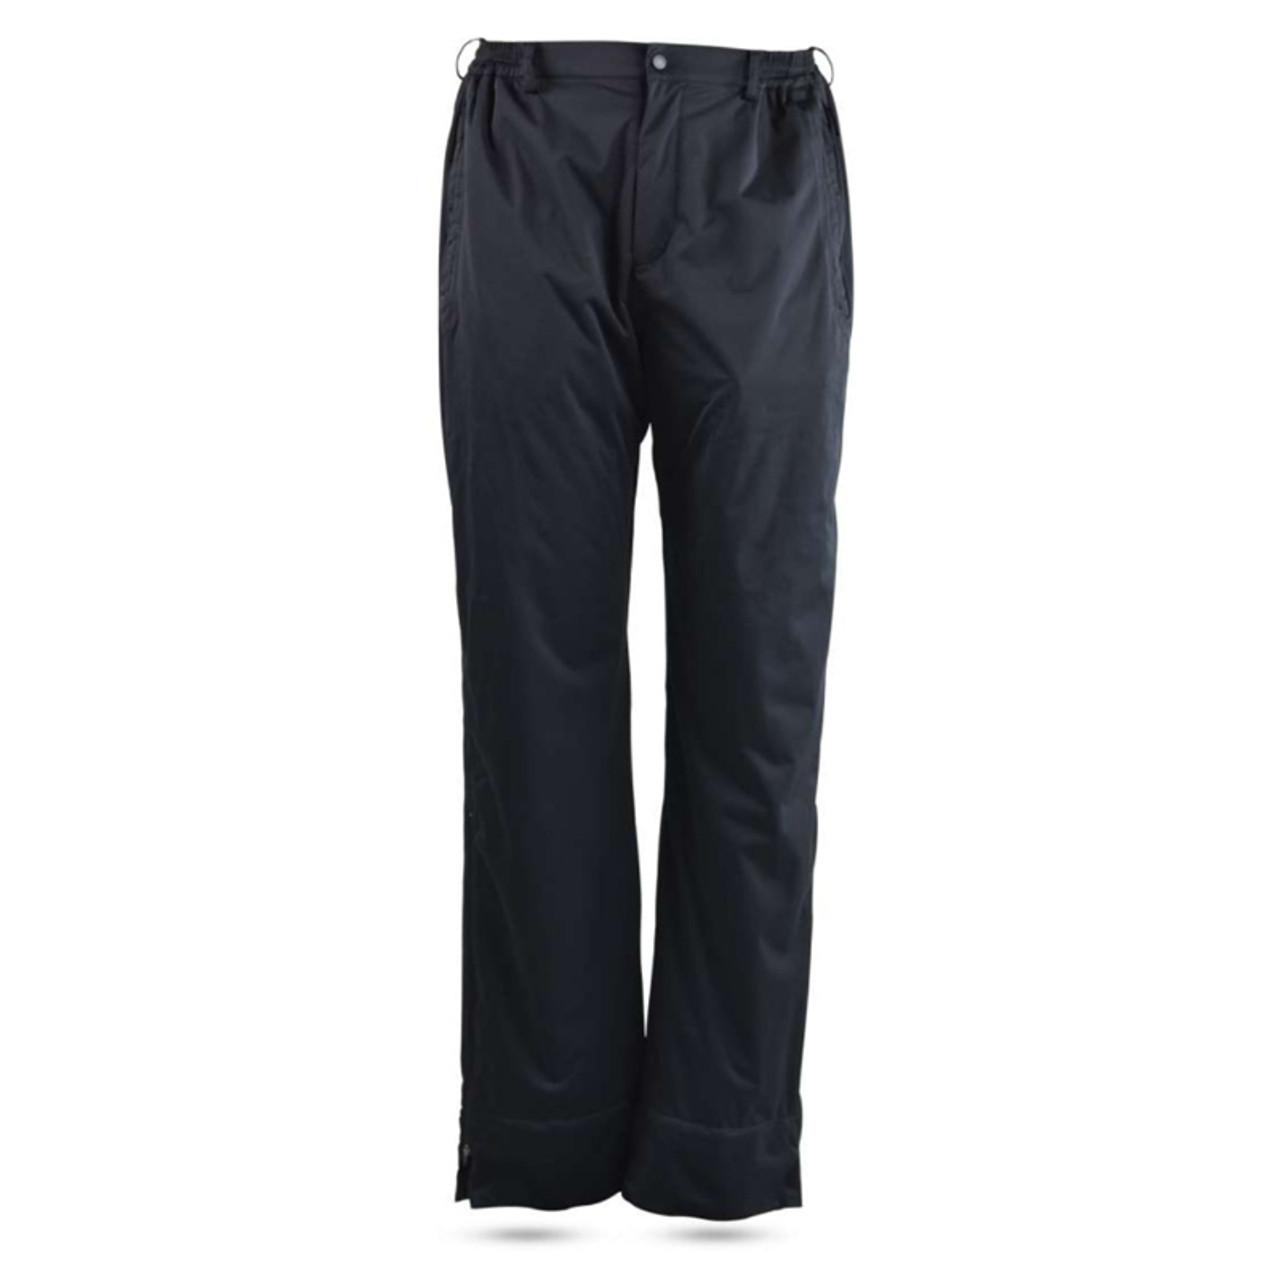 Sun Mountain RainFlex Elite Pants - Black